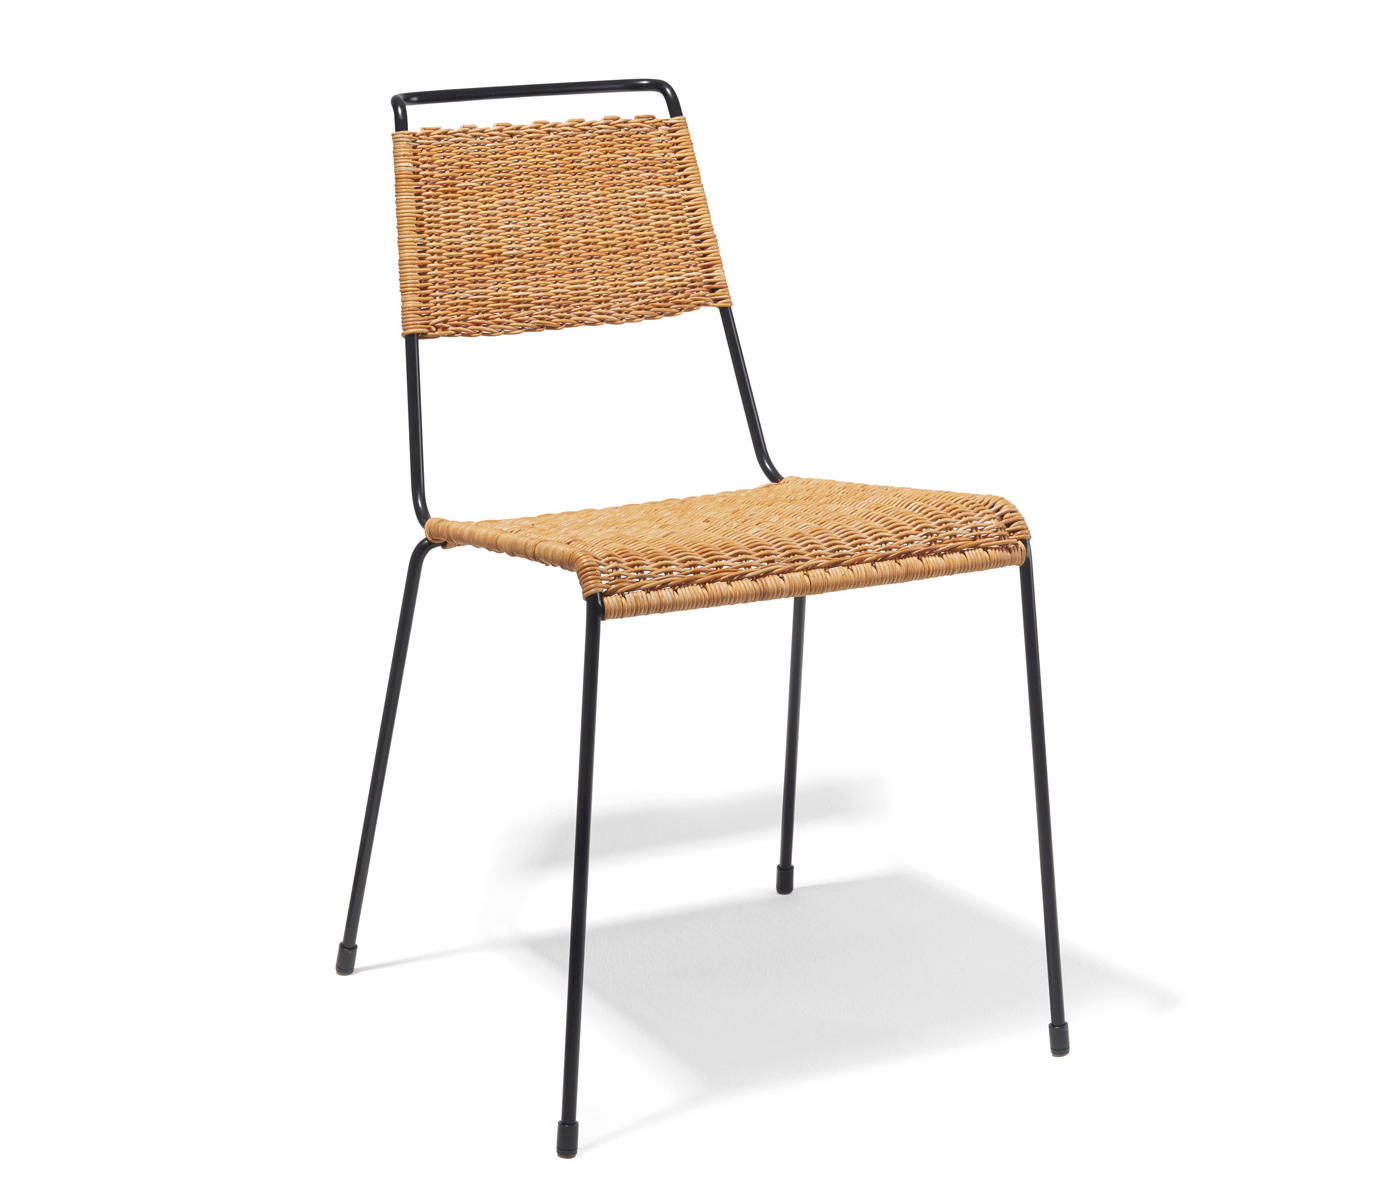 Superior TT54 Rattan Chair By Richard Lampert   Restaurant Chairs